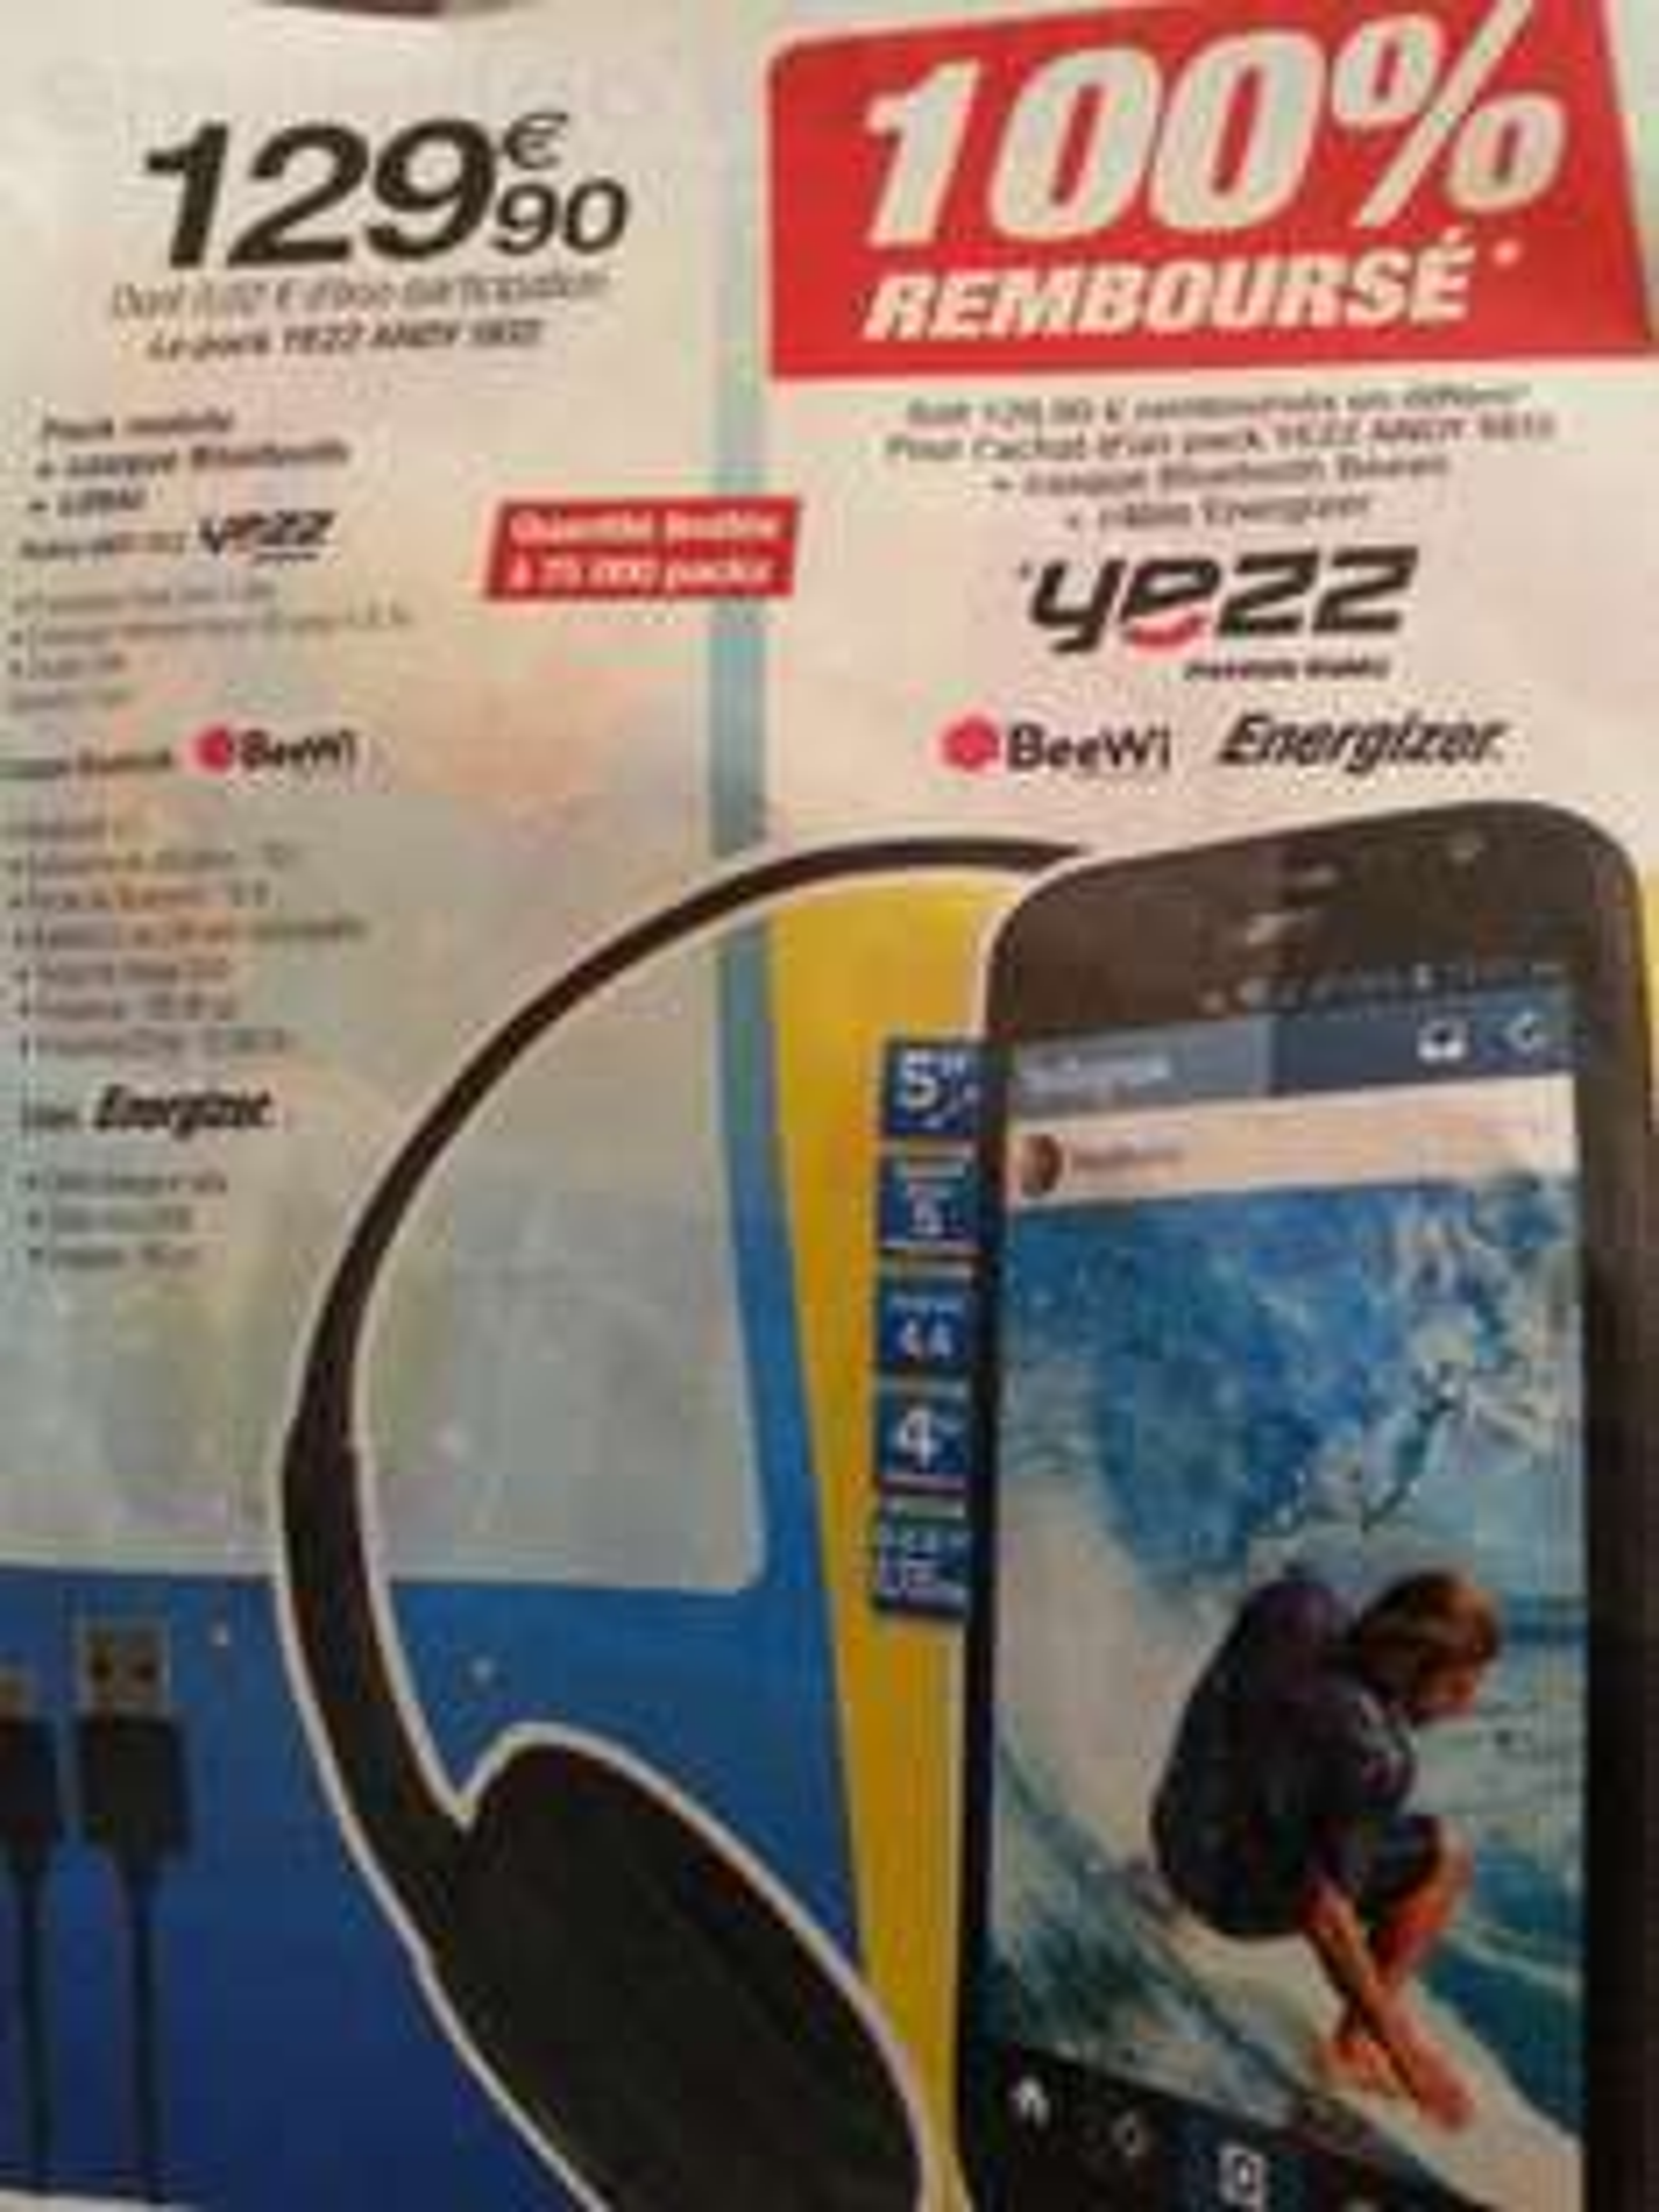 Pack mobile Yezz Andy A5EI + Casque bluetooth BeeWi + Câble Energizer (100% remboursé via ODR)